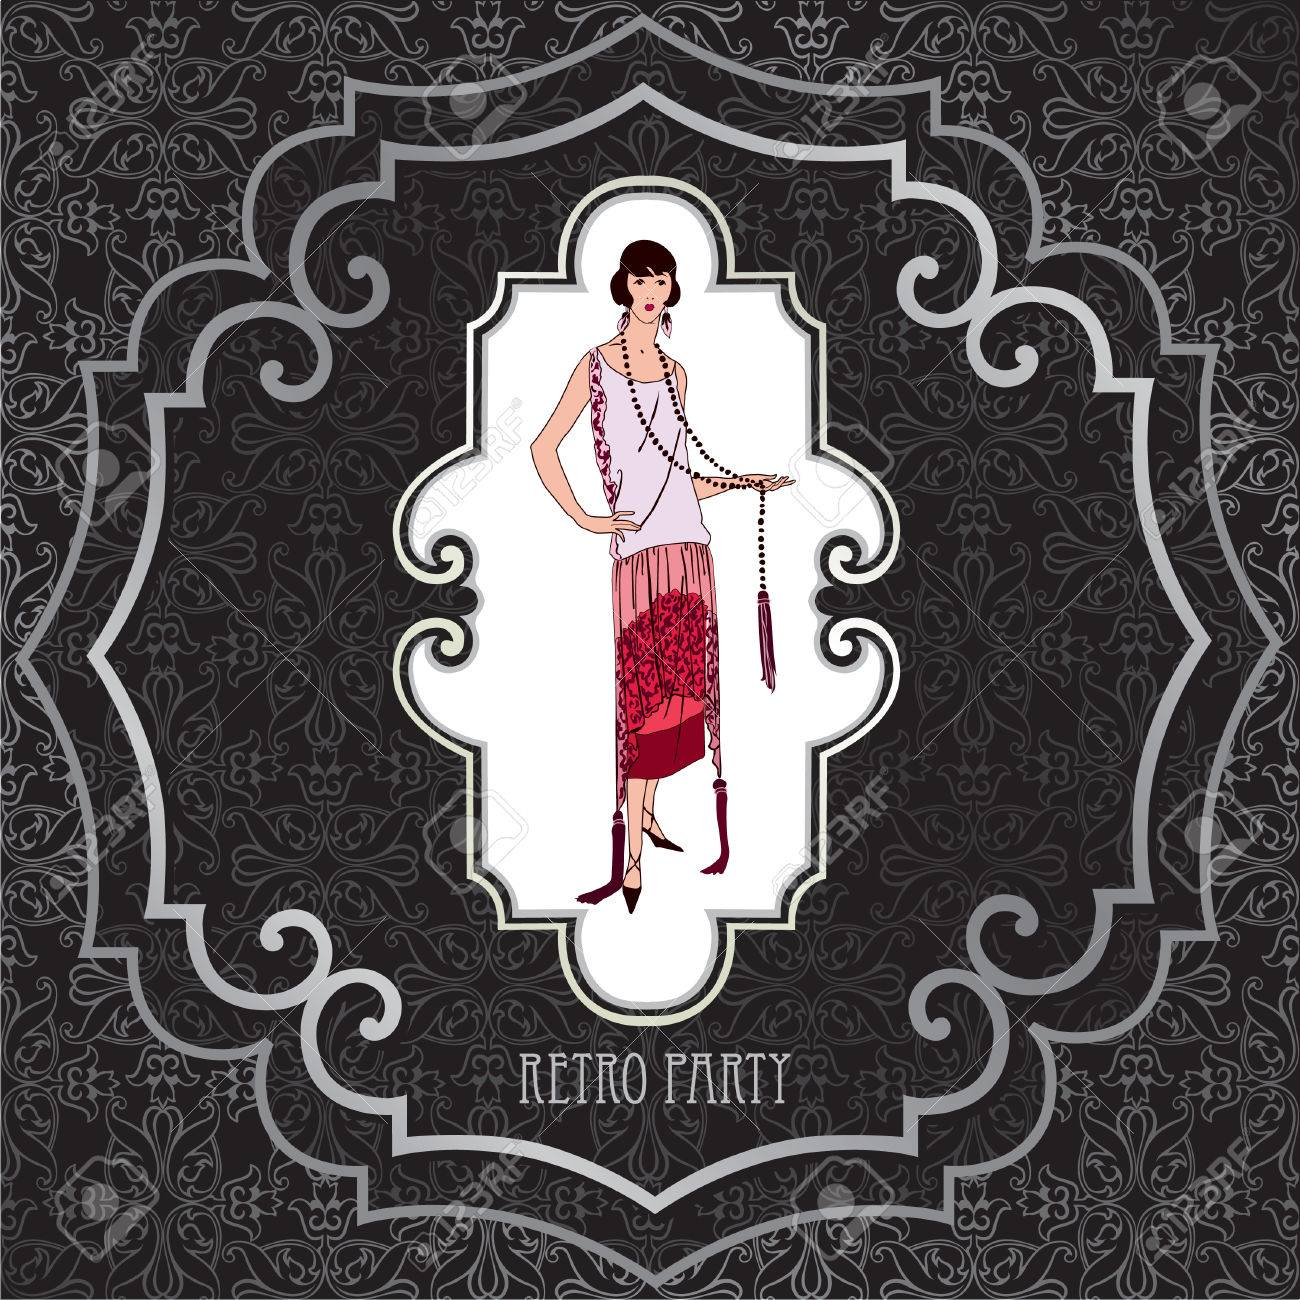 Retro Party Invitation Design. Flapper Girl Over Vintage ...